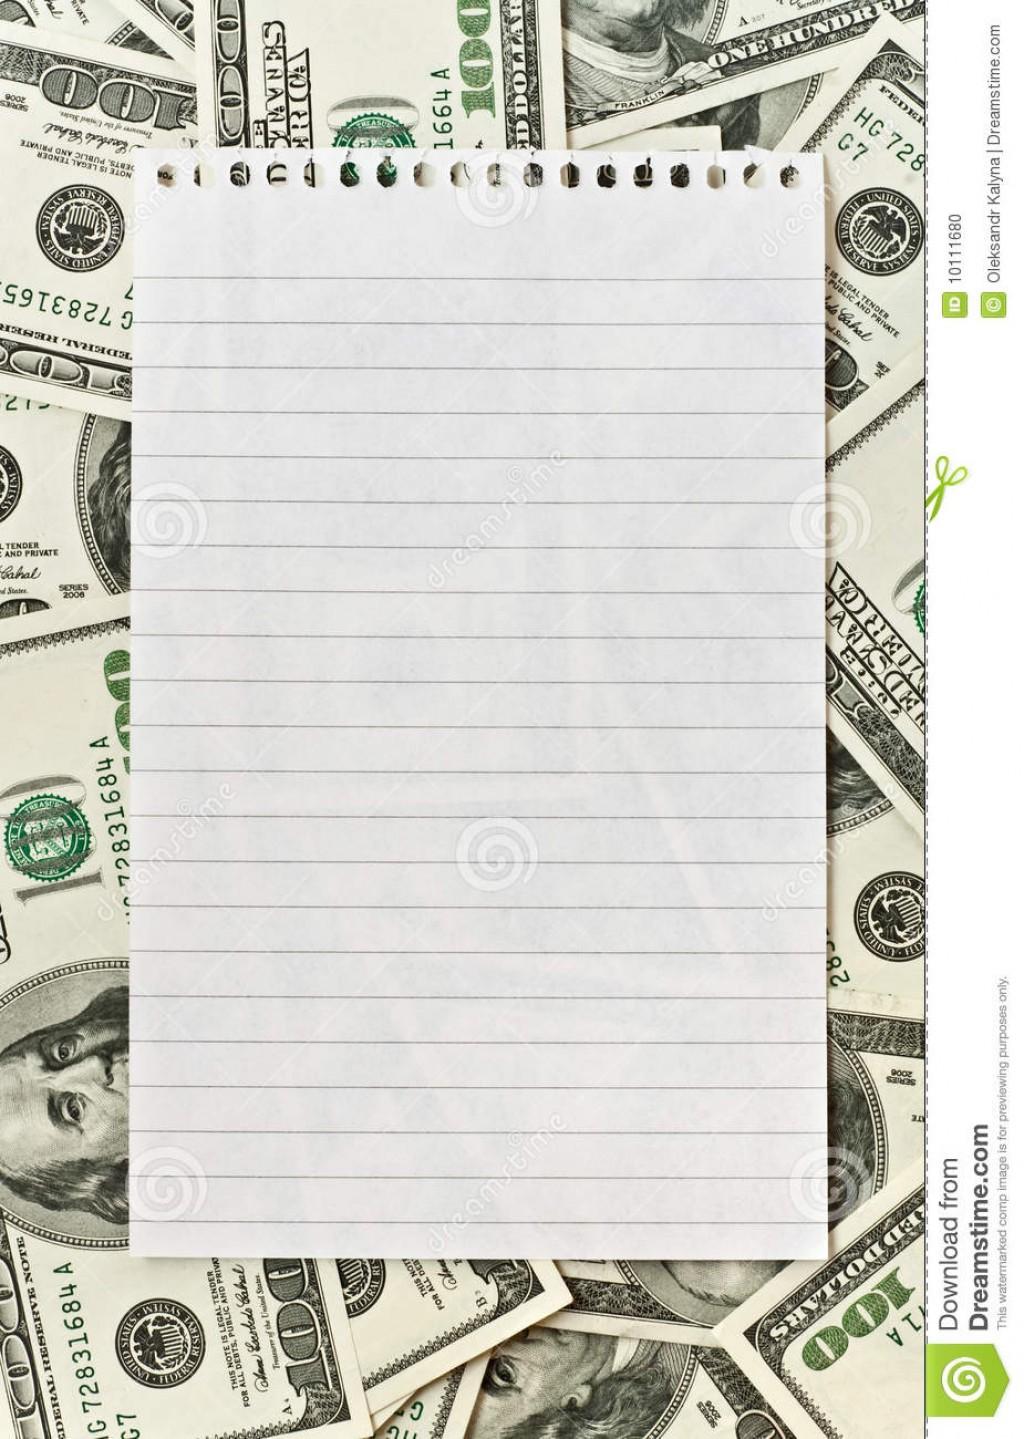 016 Blank White Paper Over Money Background Write Essays For Essay Best University High School Reddit Large